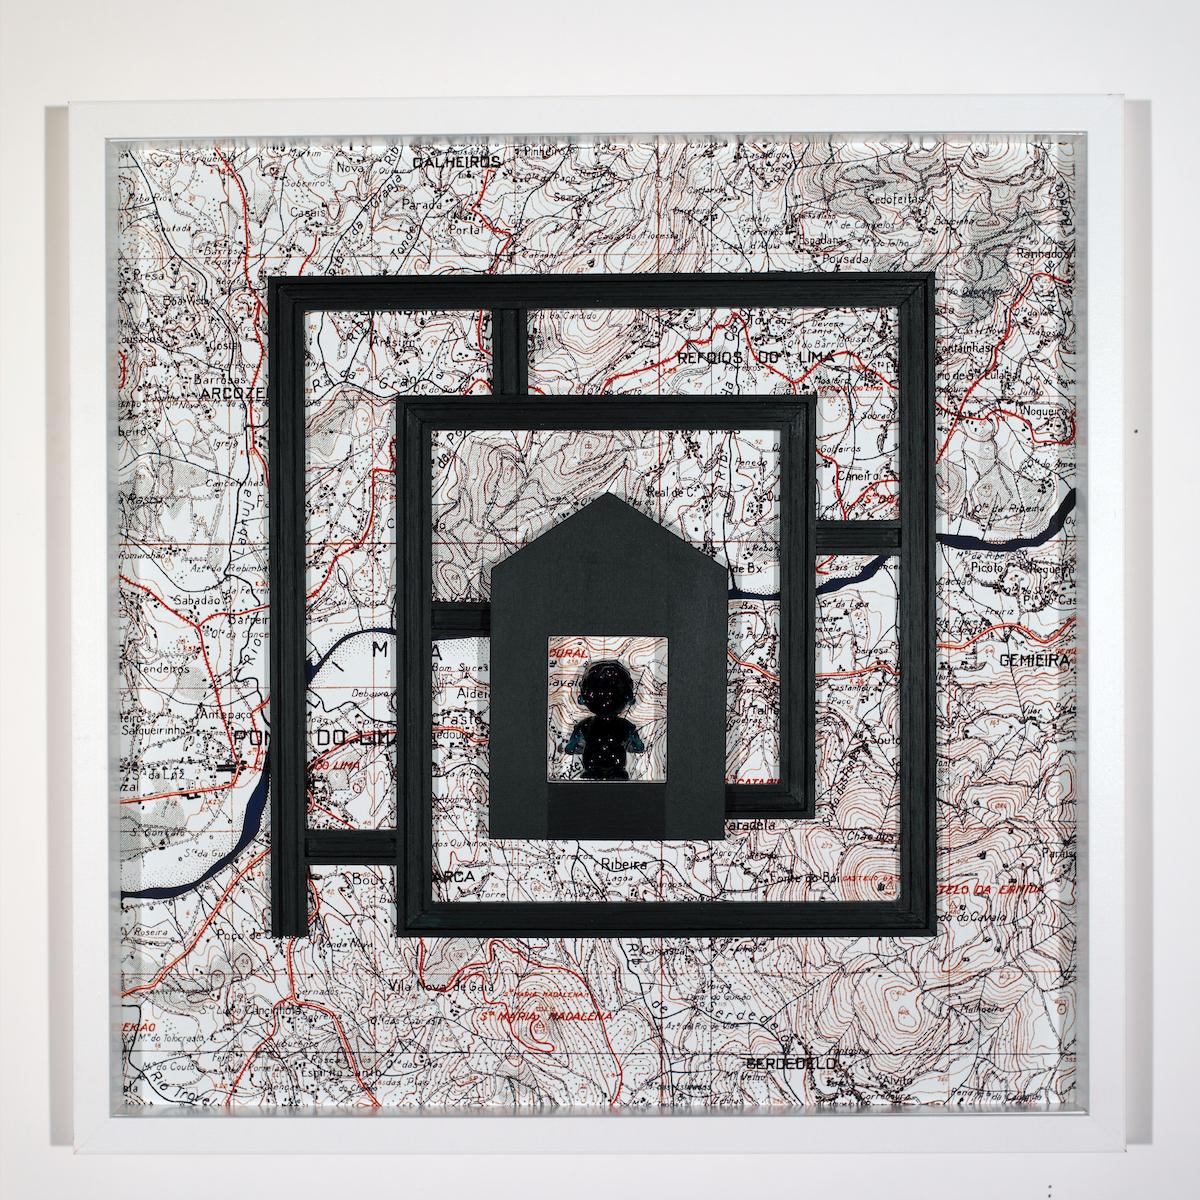 Labyrinth, 2005